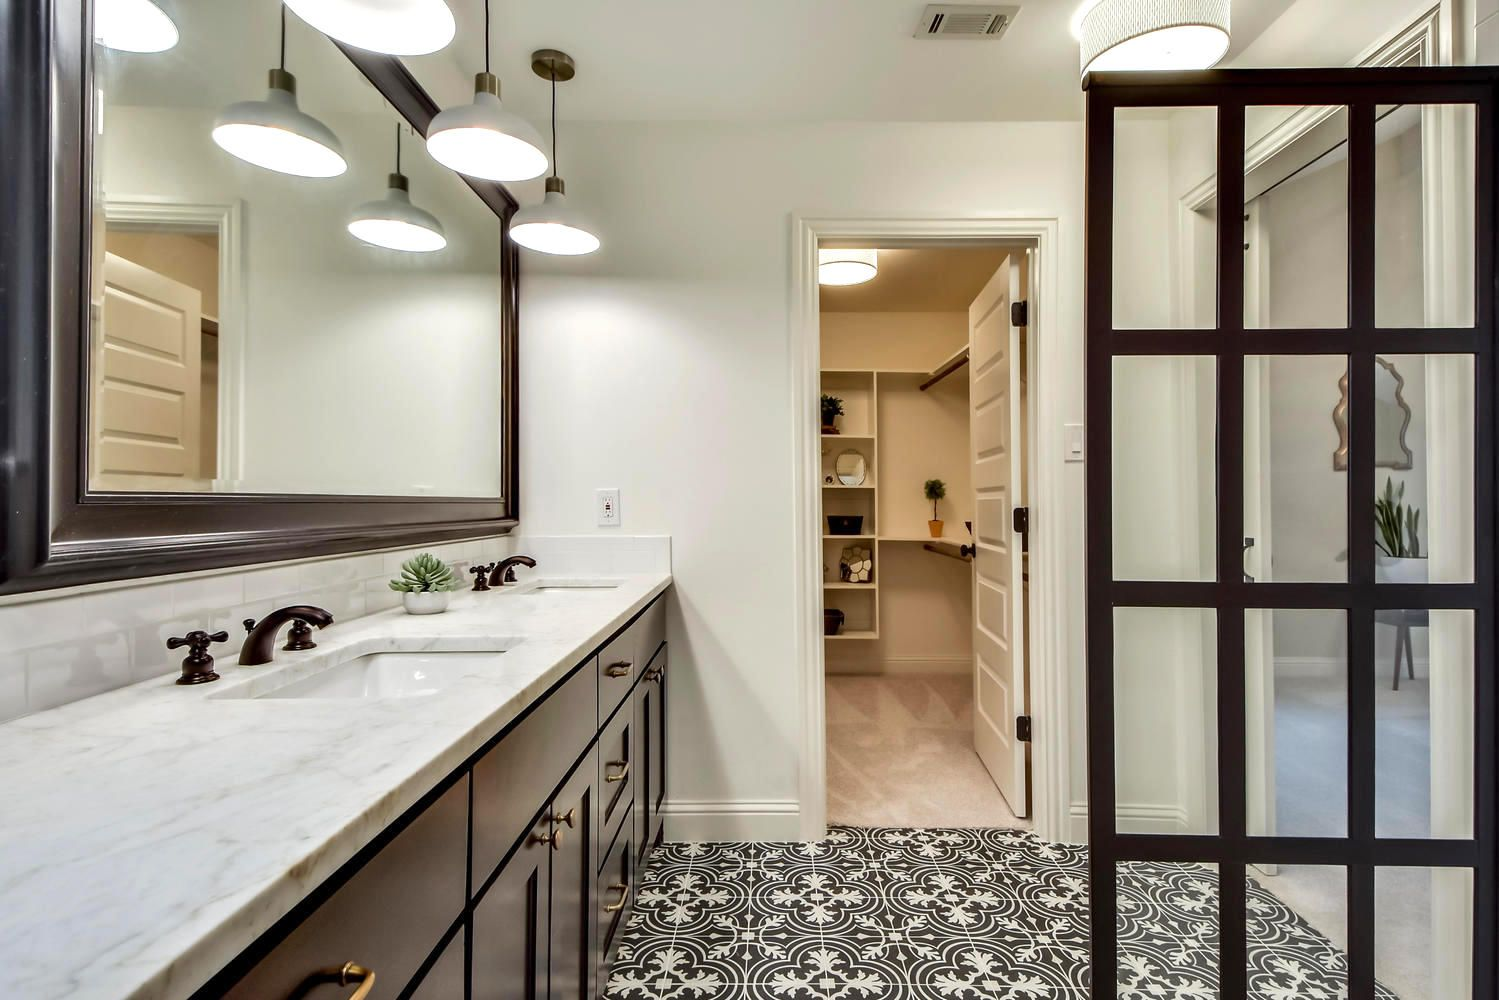 bathroom remodeling austin tx. Black And White Bathroom Remodel By Melisa Clement Designs In Austin, TX With Patterned Tile Remodeling Austin Tx